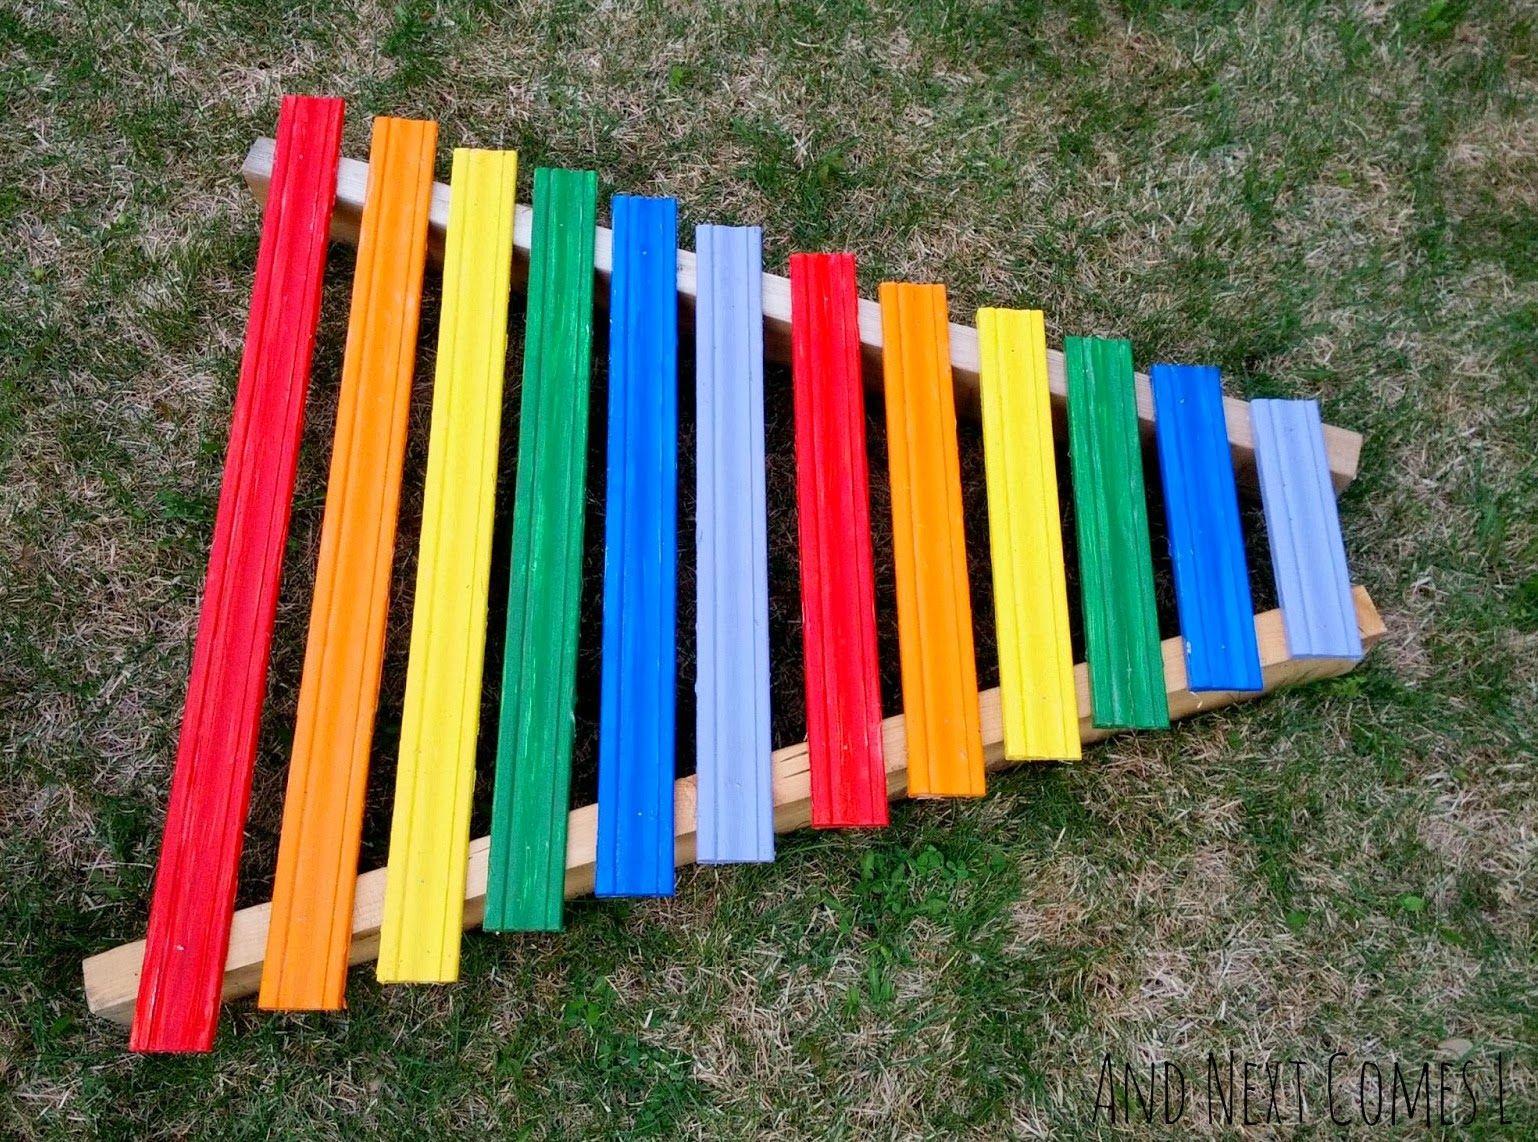 14 diy musical instruments | pre-school | pinterest | diy toys, kid